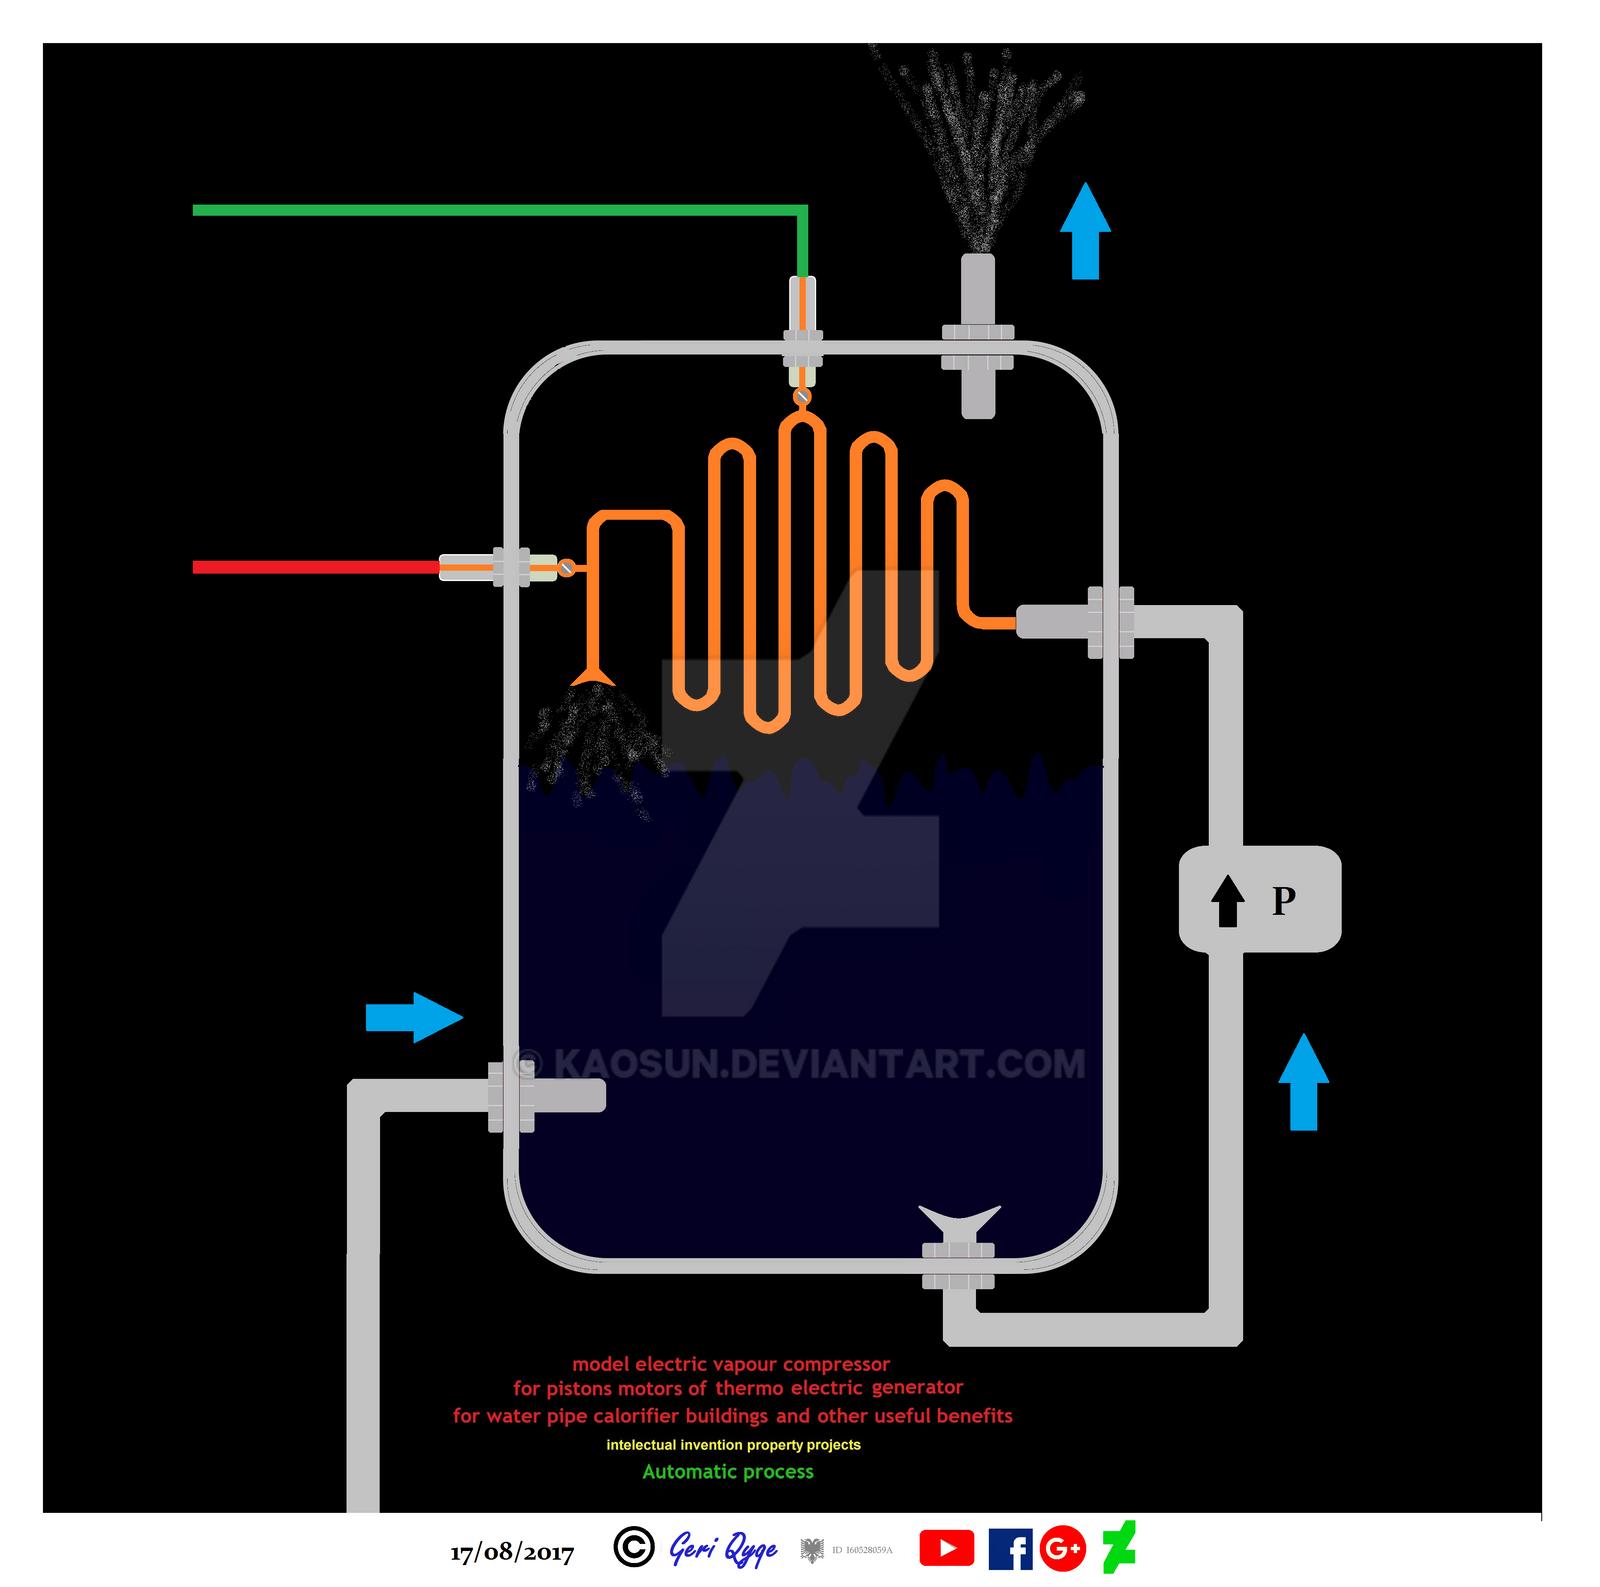 Tubular Electric Resistance Tank Presure by Kaosun